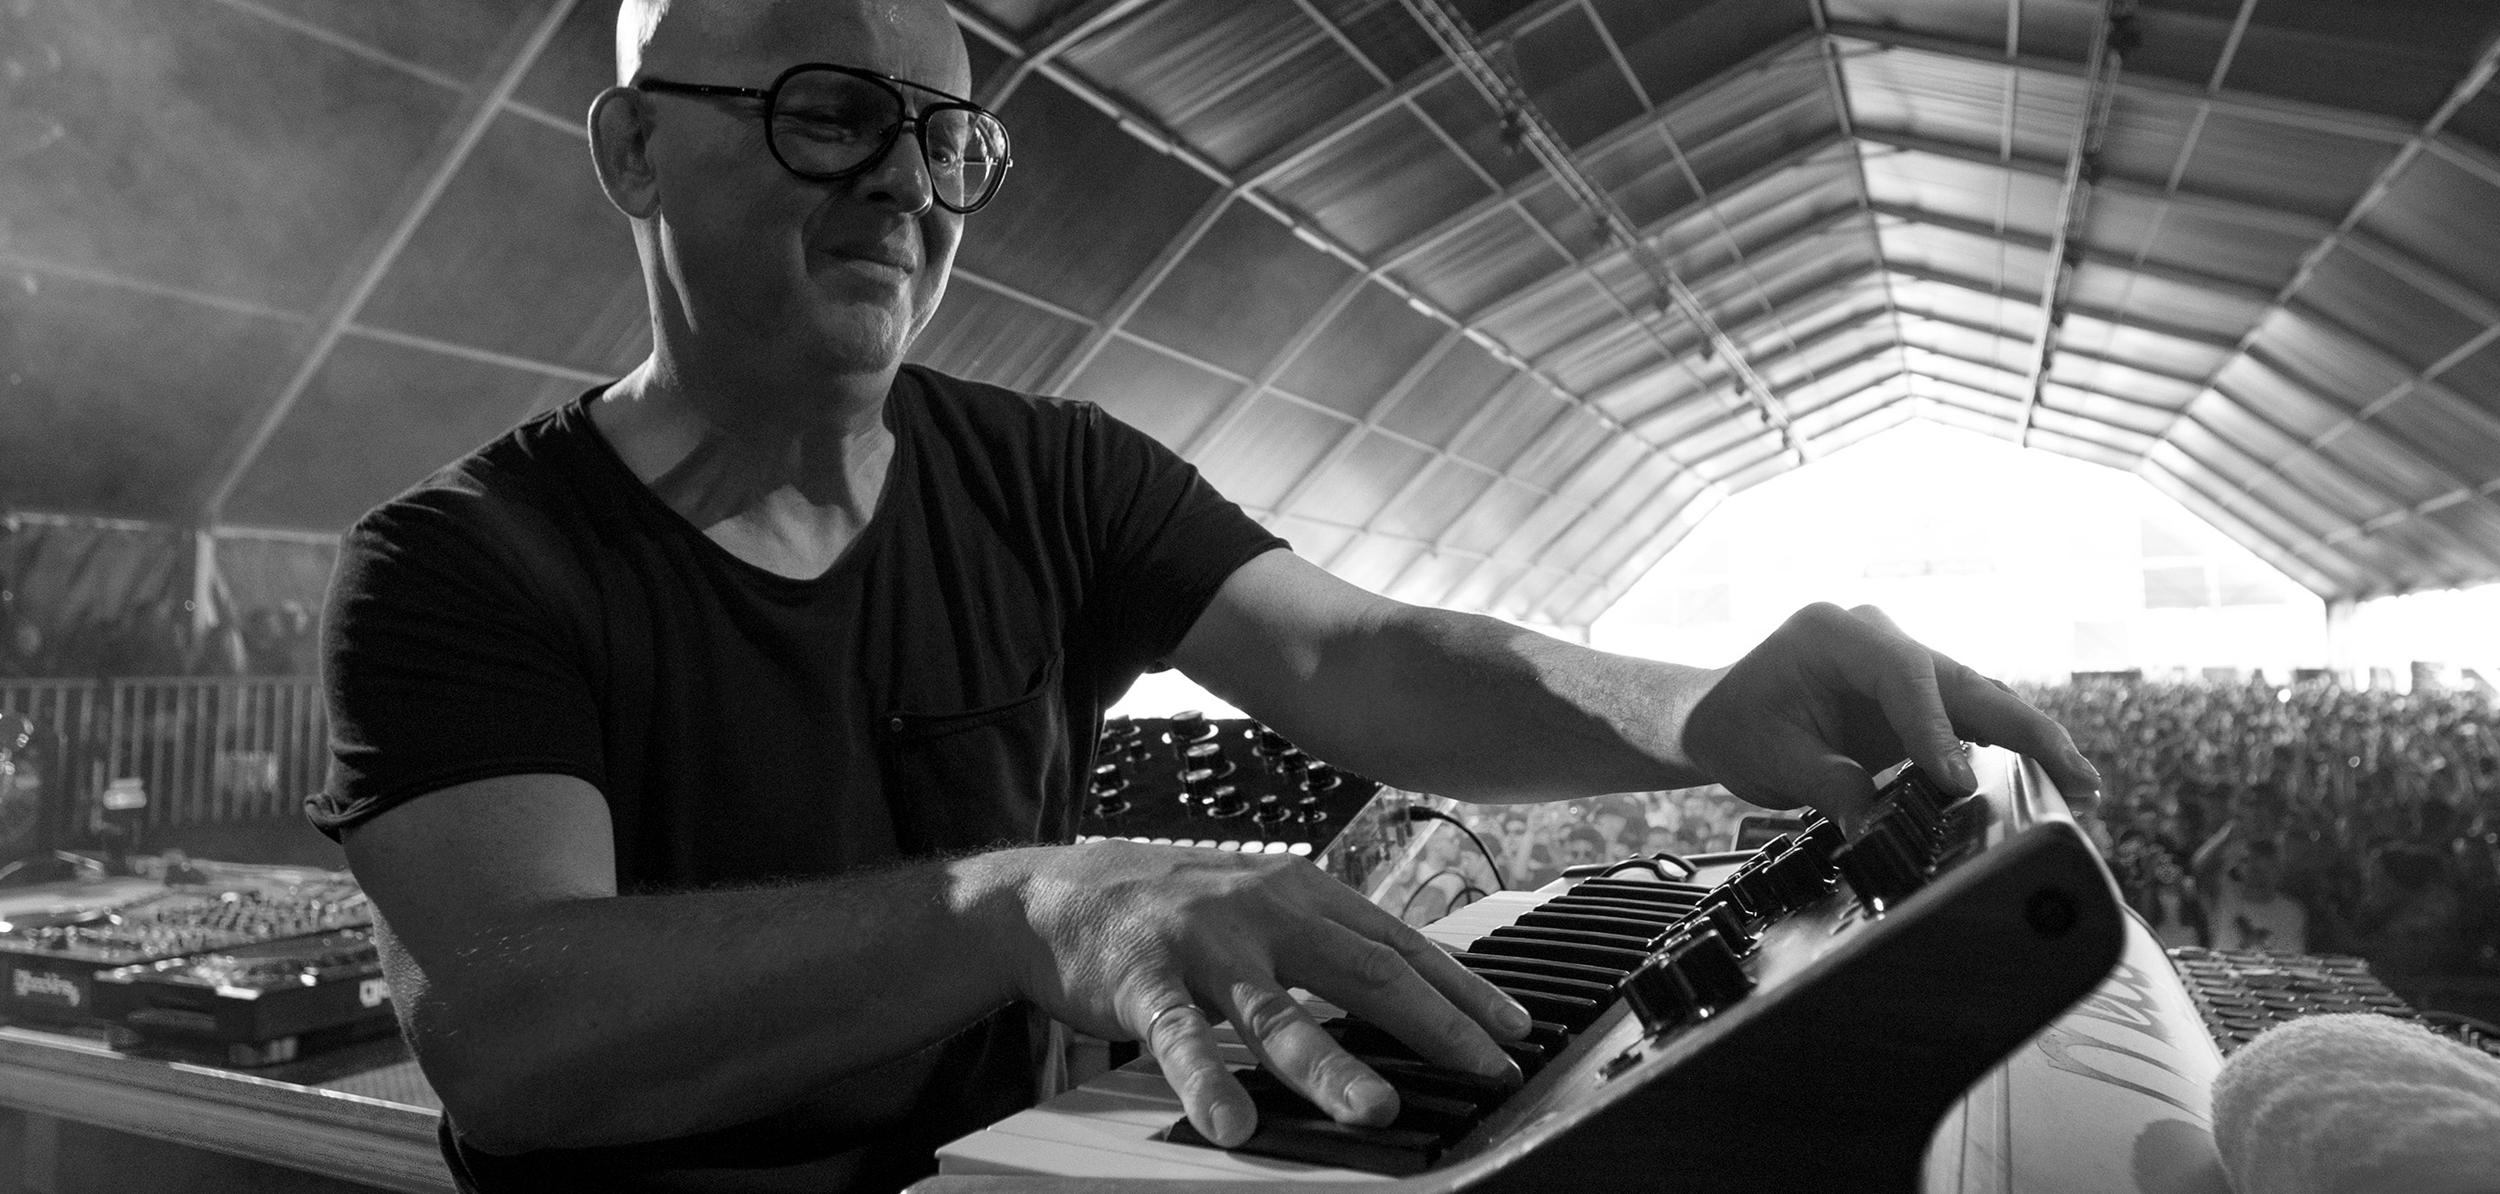 #Asobitai #Eastfestival #Ame #Bodzin #Dixon #AgentsofTime #Geranium #Dj #Epizode #Vietnam #Ibiza #Hiveh #Music #Festival #Peru #Uruguay #Urgell #Kalkbrenner #PaulKalkbrenner